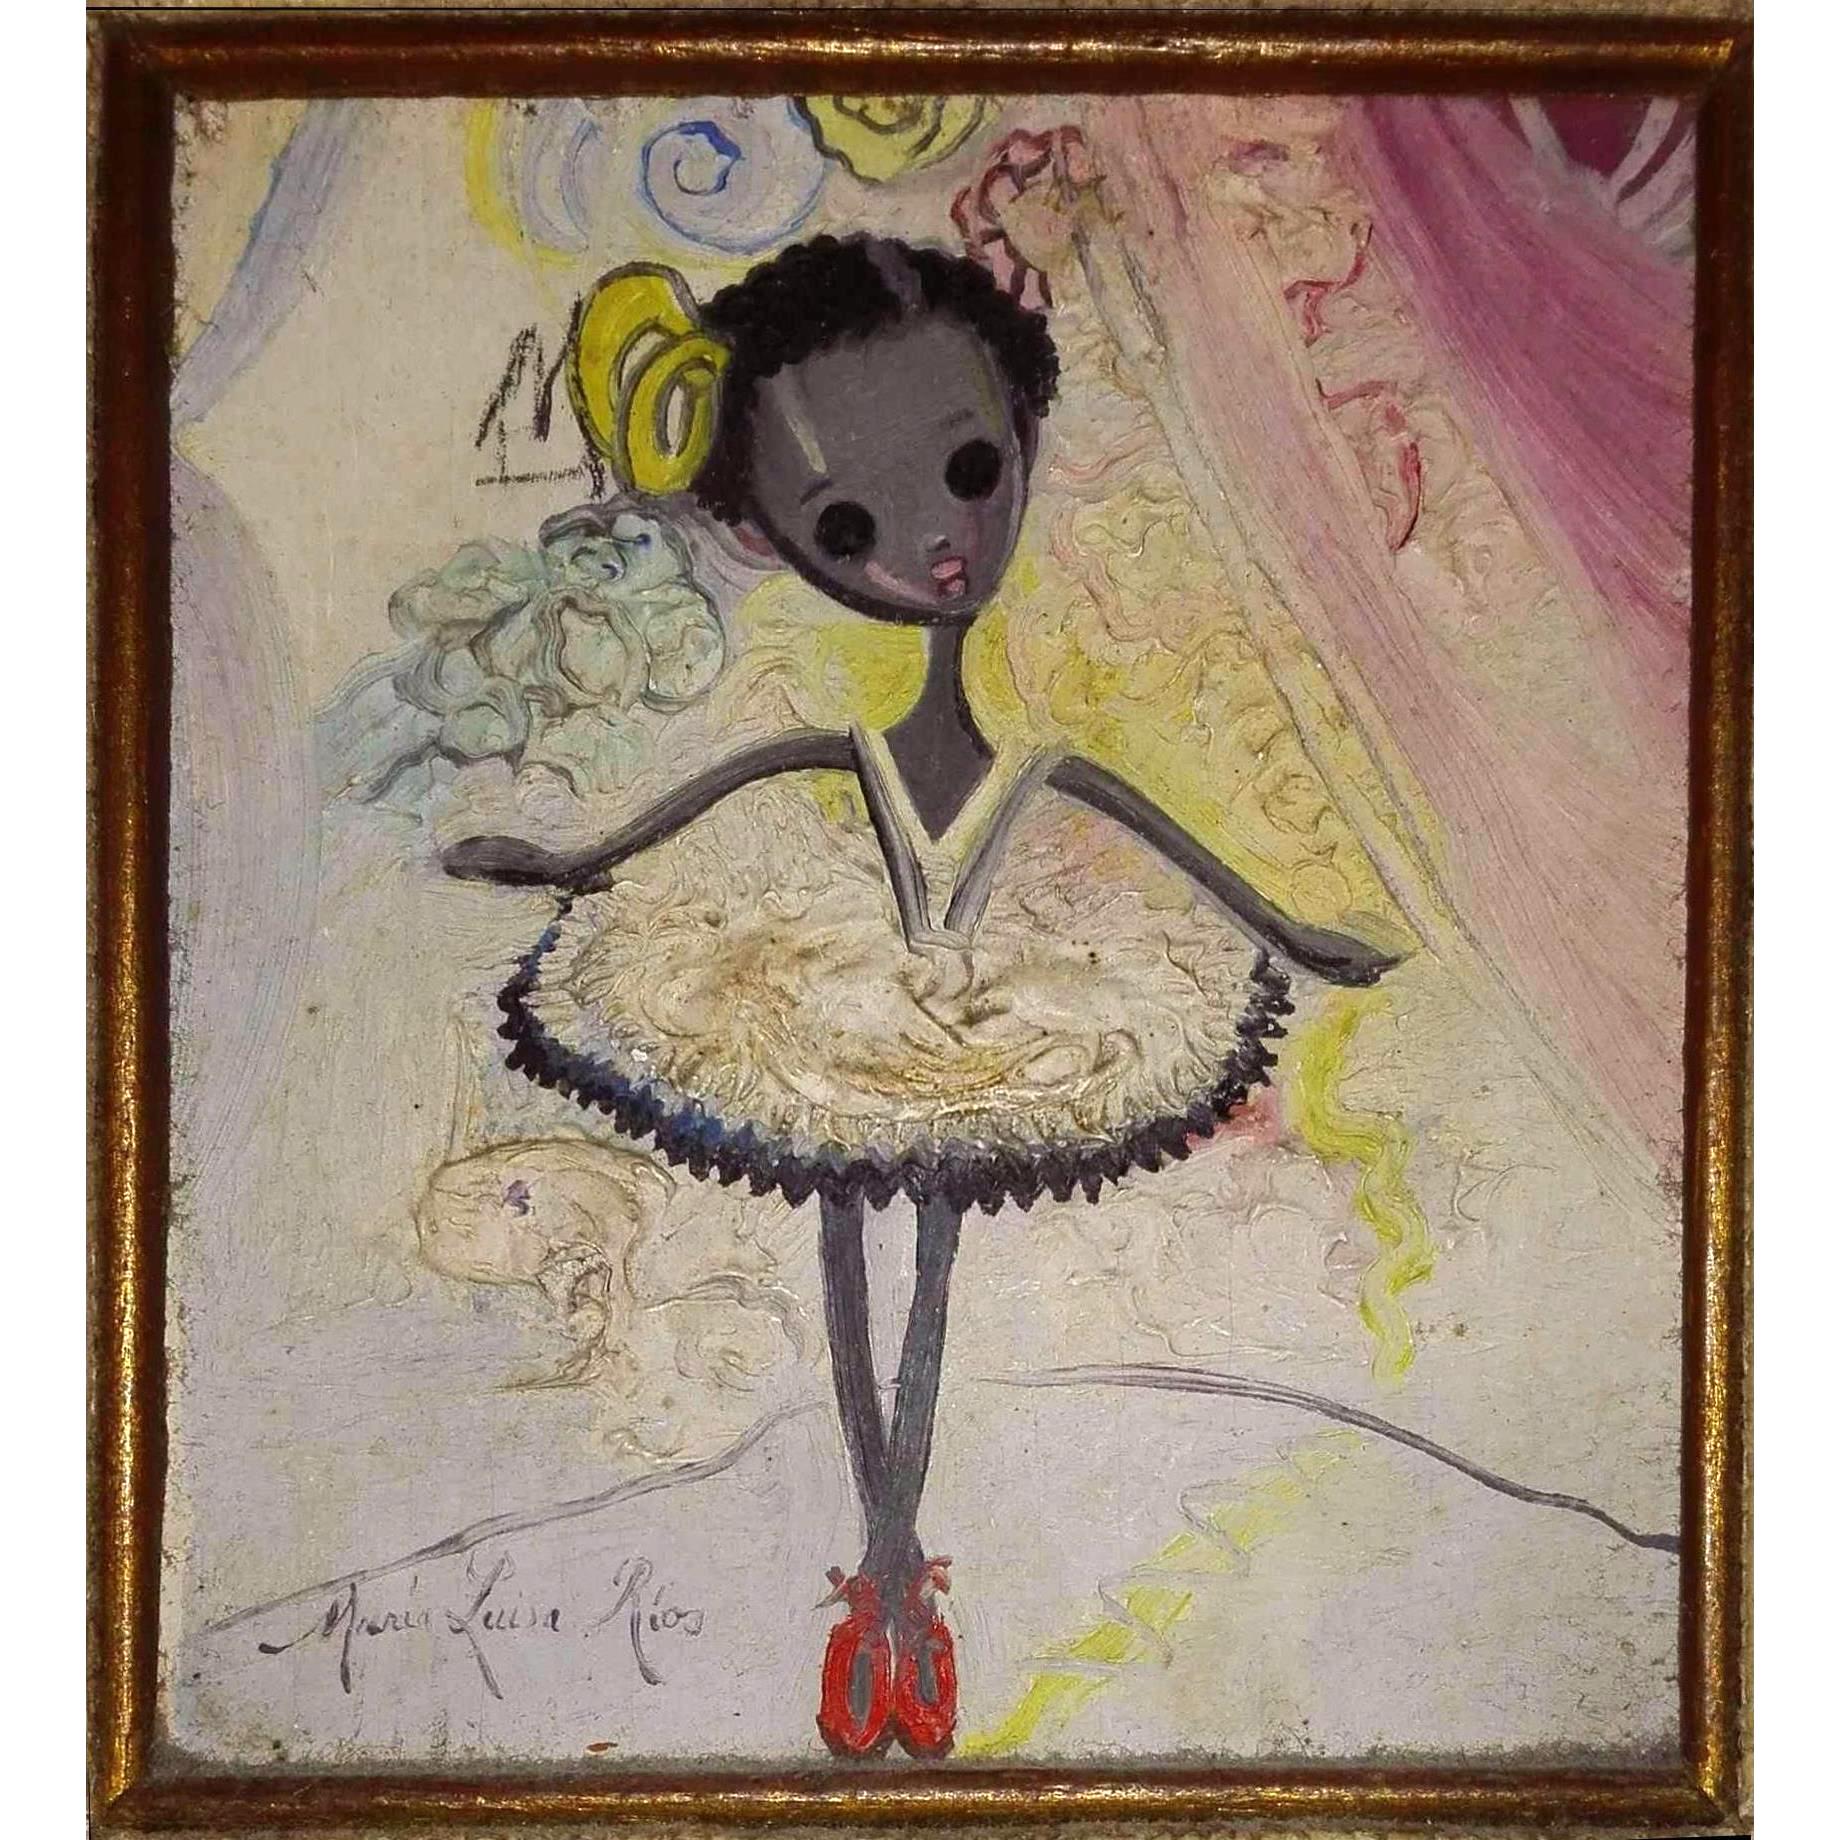 Maria Luisa RIOS pittrice cubana XX secolo